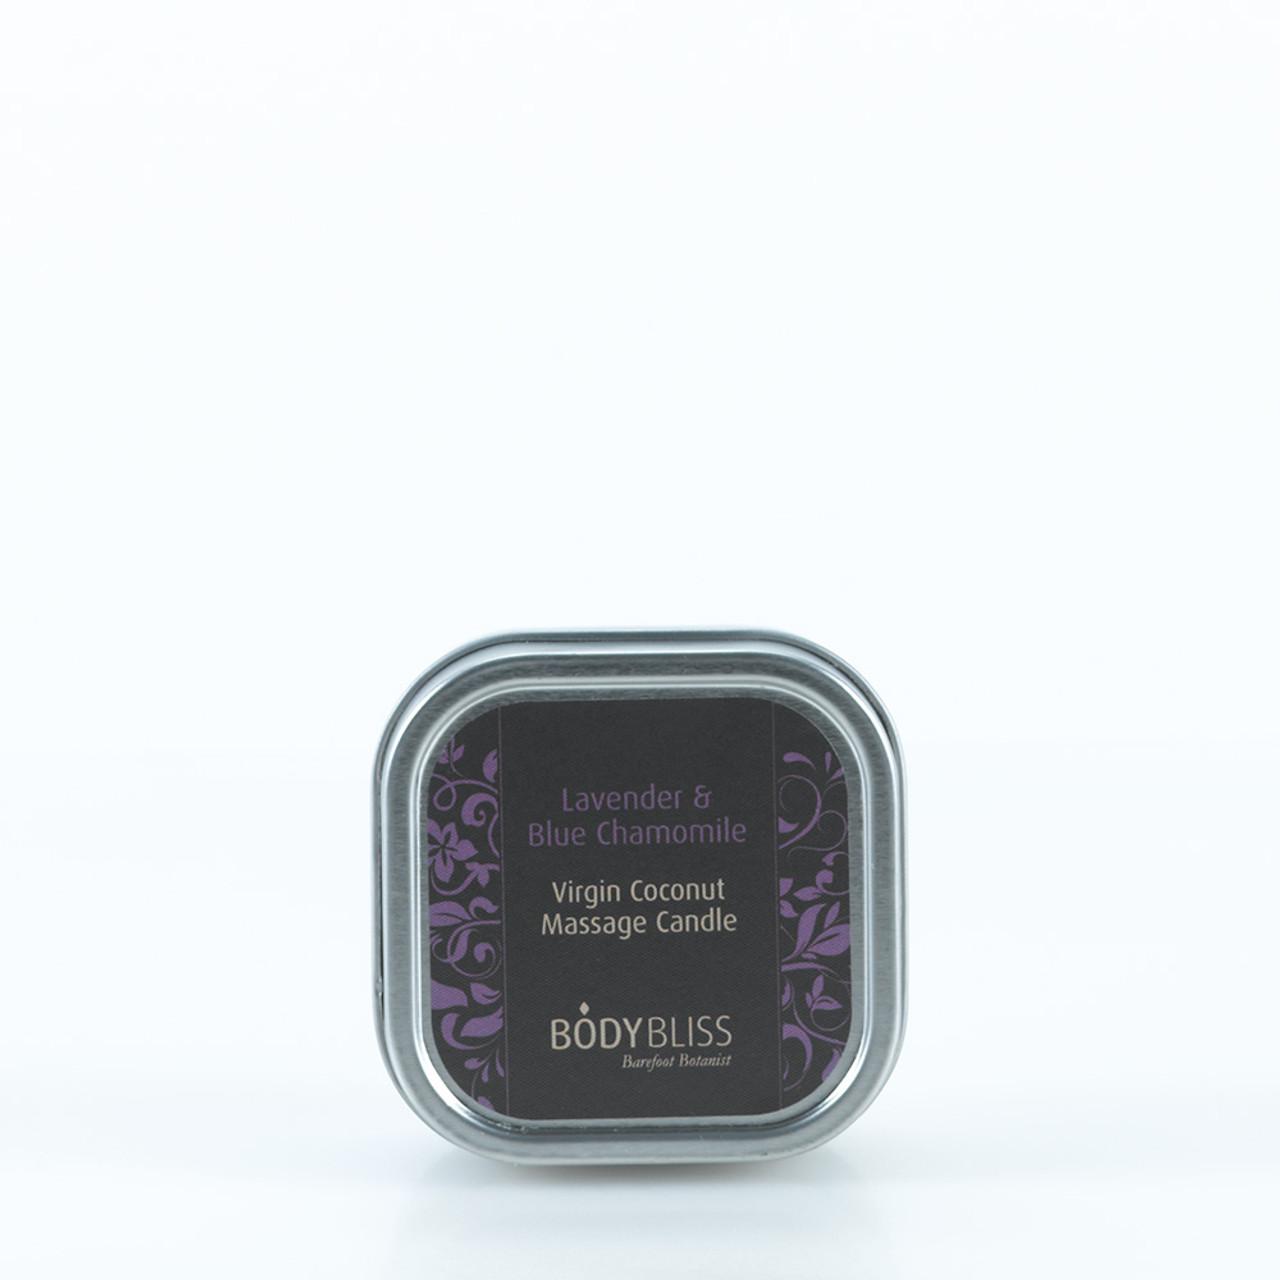 Lavender & Blue Chamomile Virgin Coconut Massage Candle